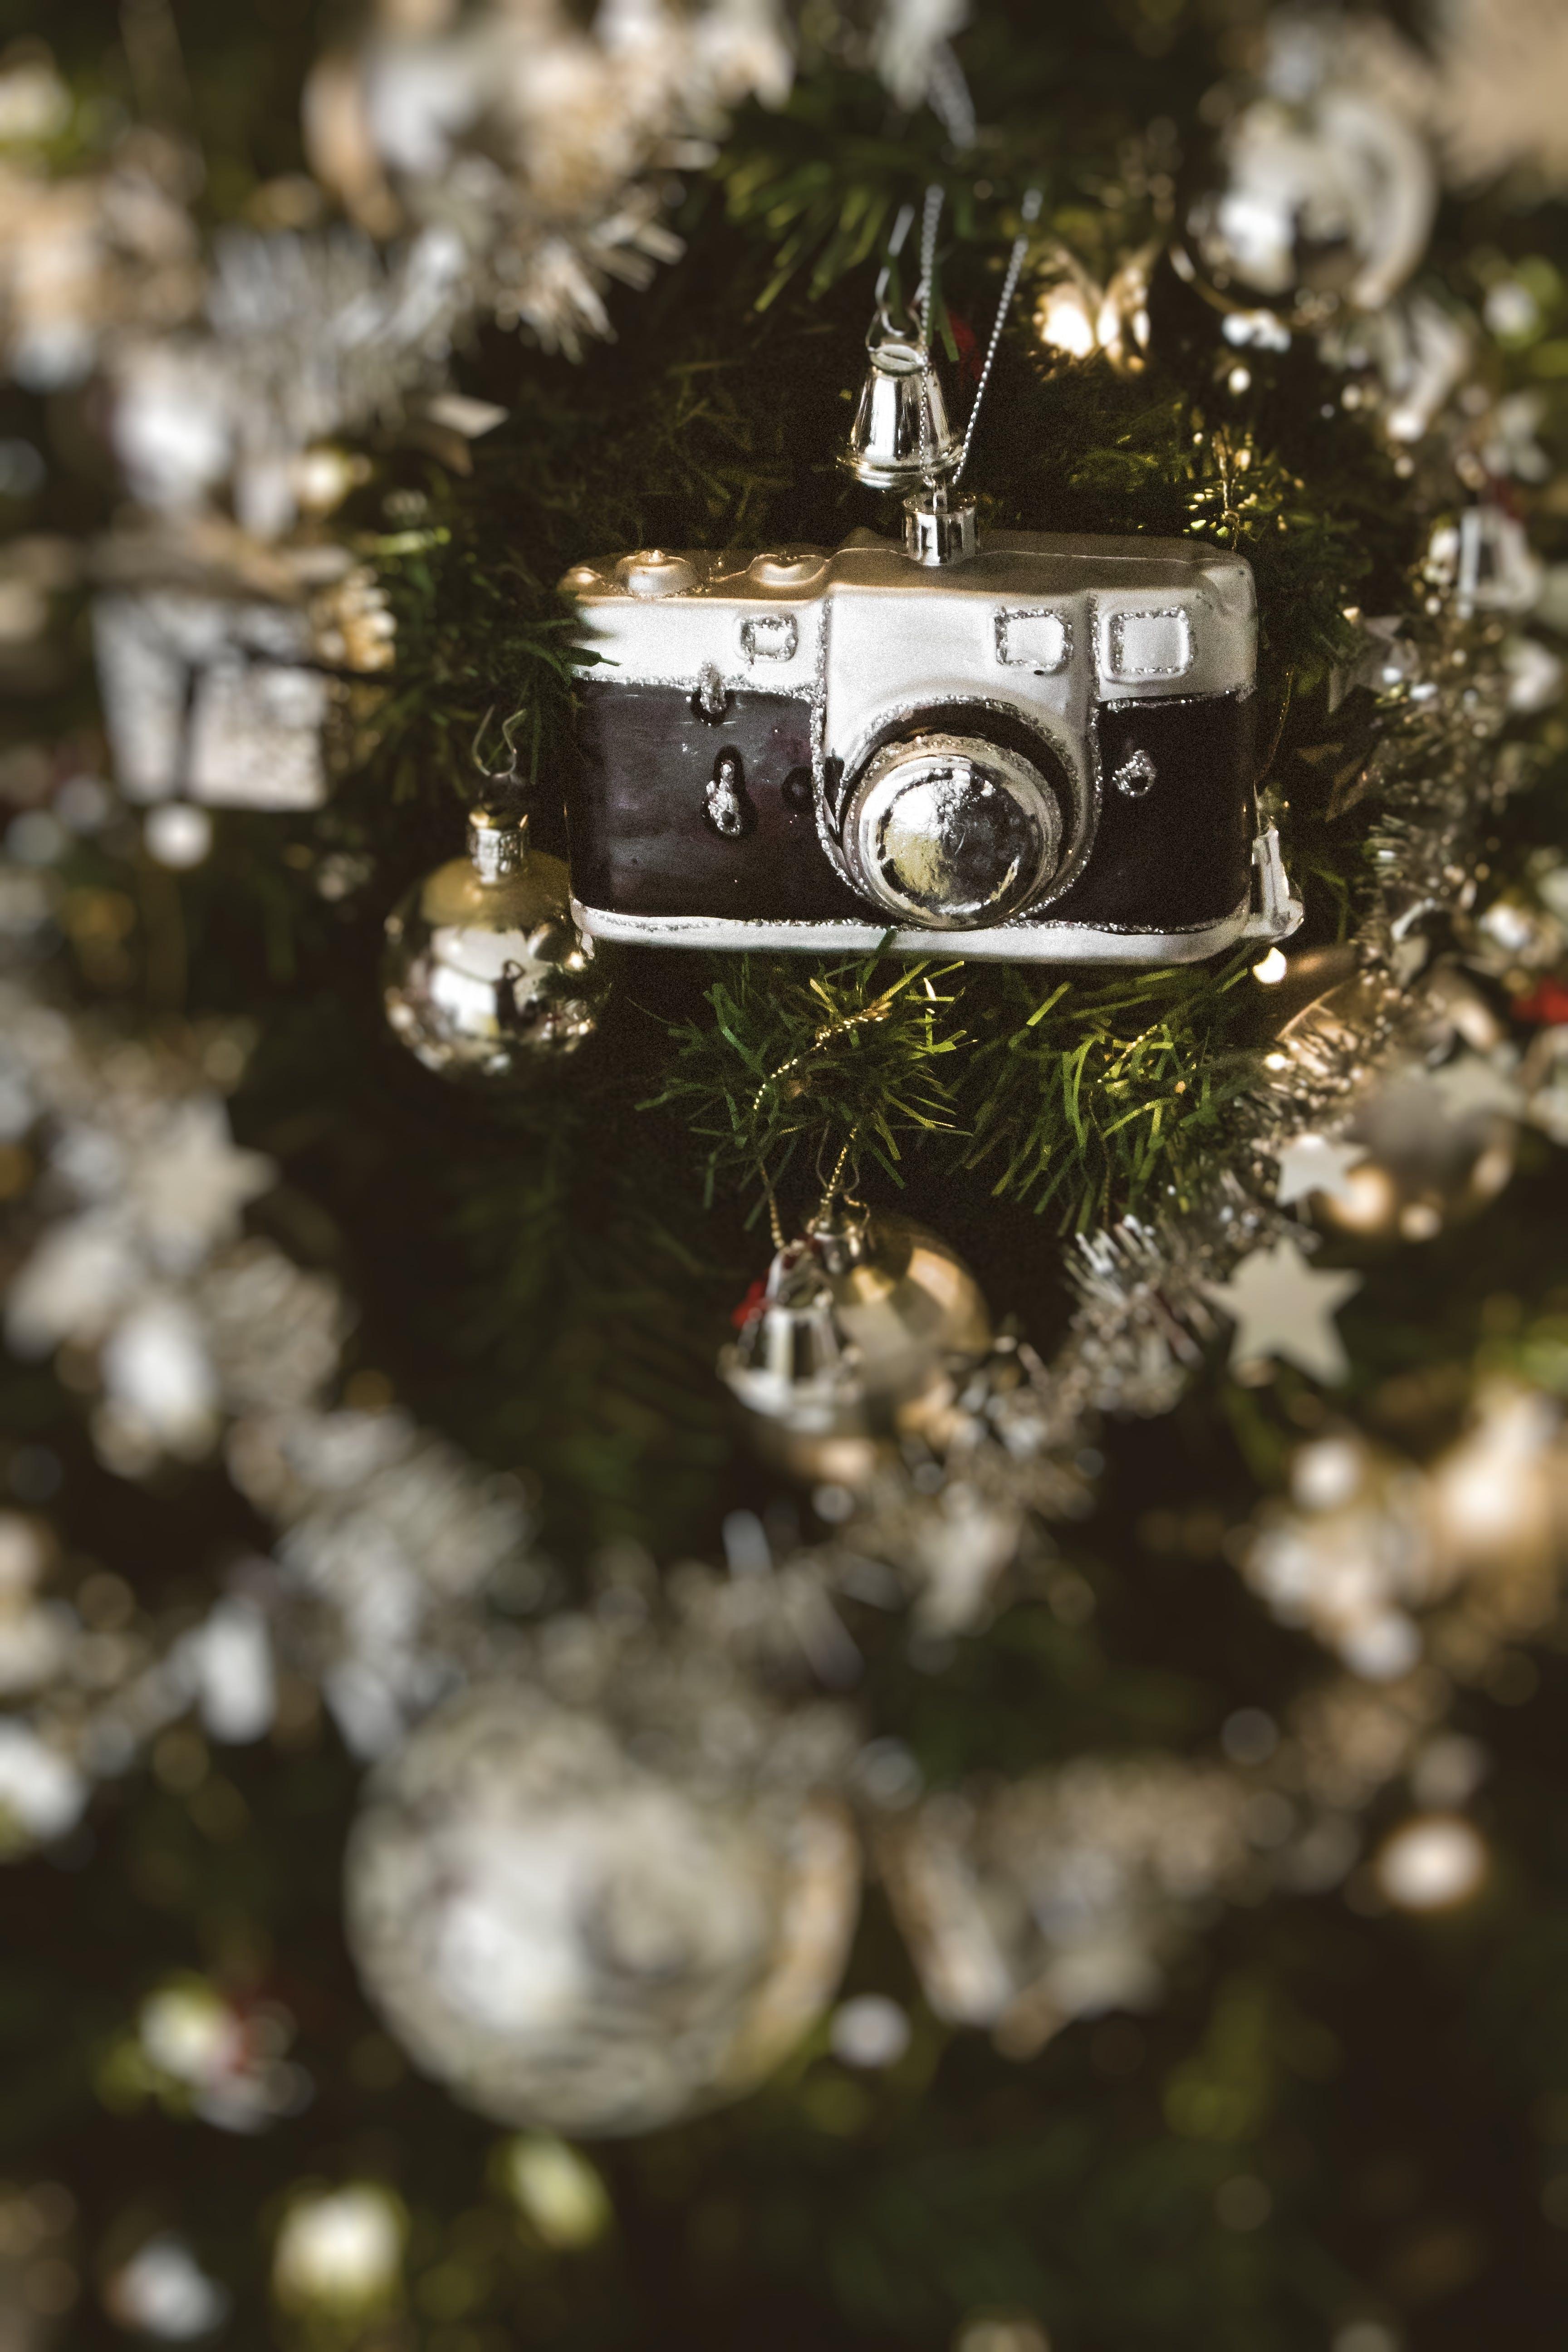 Black Camera Hanged on Christmas Tree